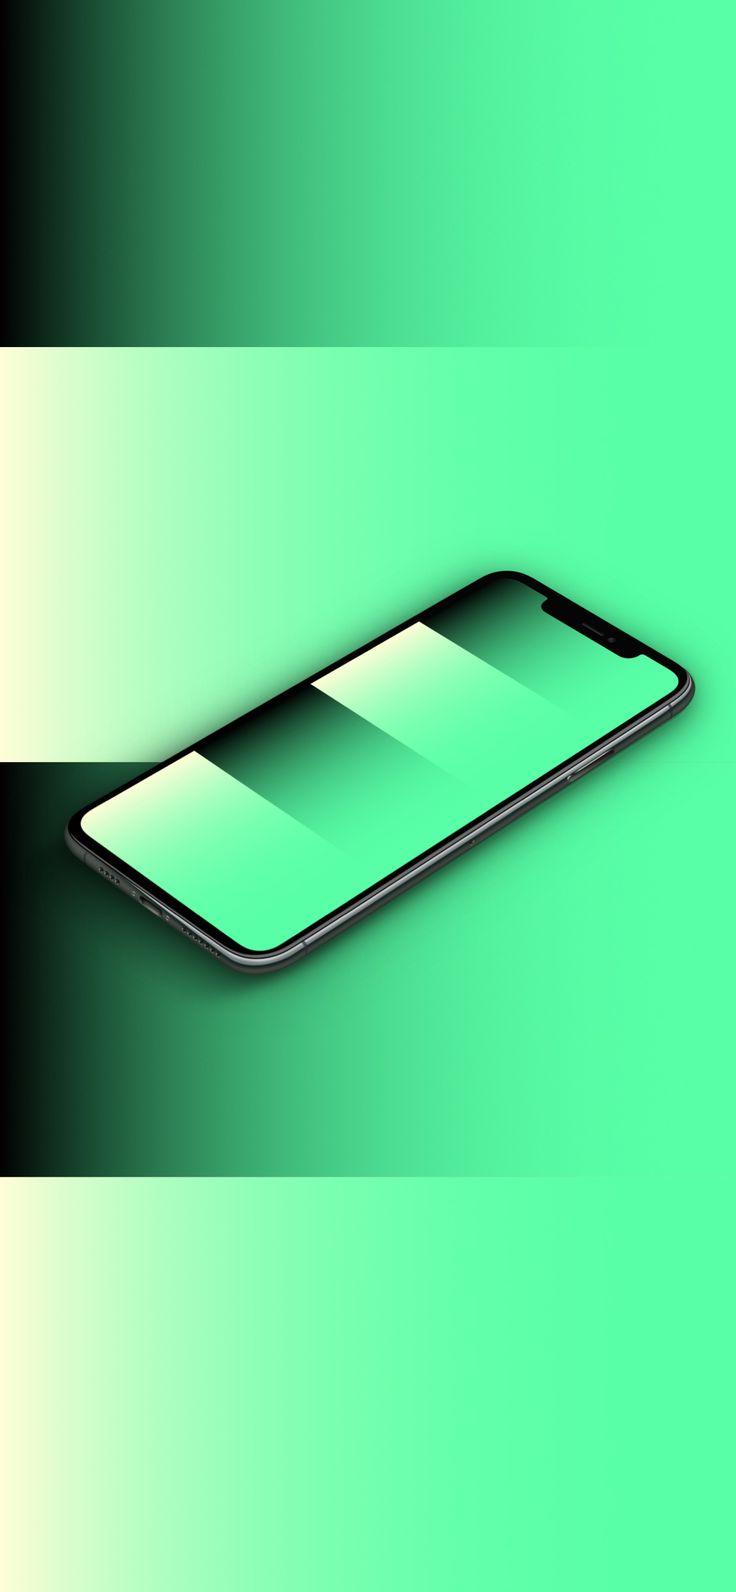 Épinglé par Hotspot4U sur iphone / ipad wallpapers en 2020